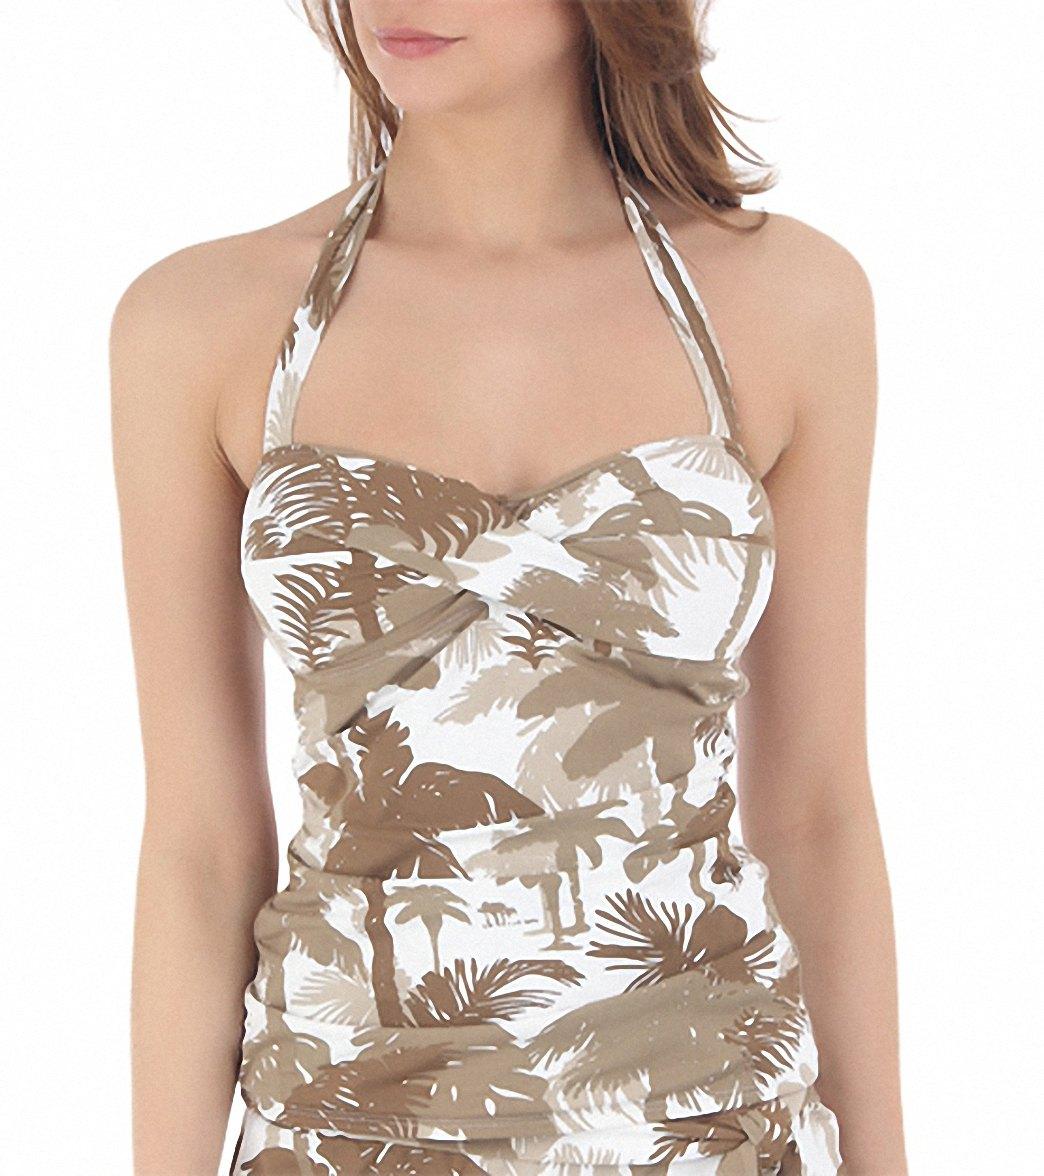 4b5dfa3b21 Tommy Bahama Swimwear Coconut Grove Palm Trees Halterkini Bikini Top at  SwimOutlet.com - Free Shipping